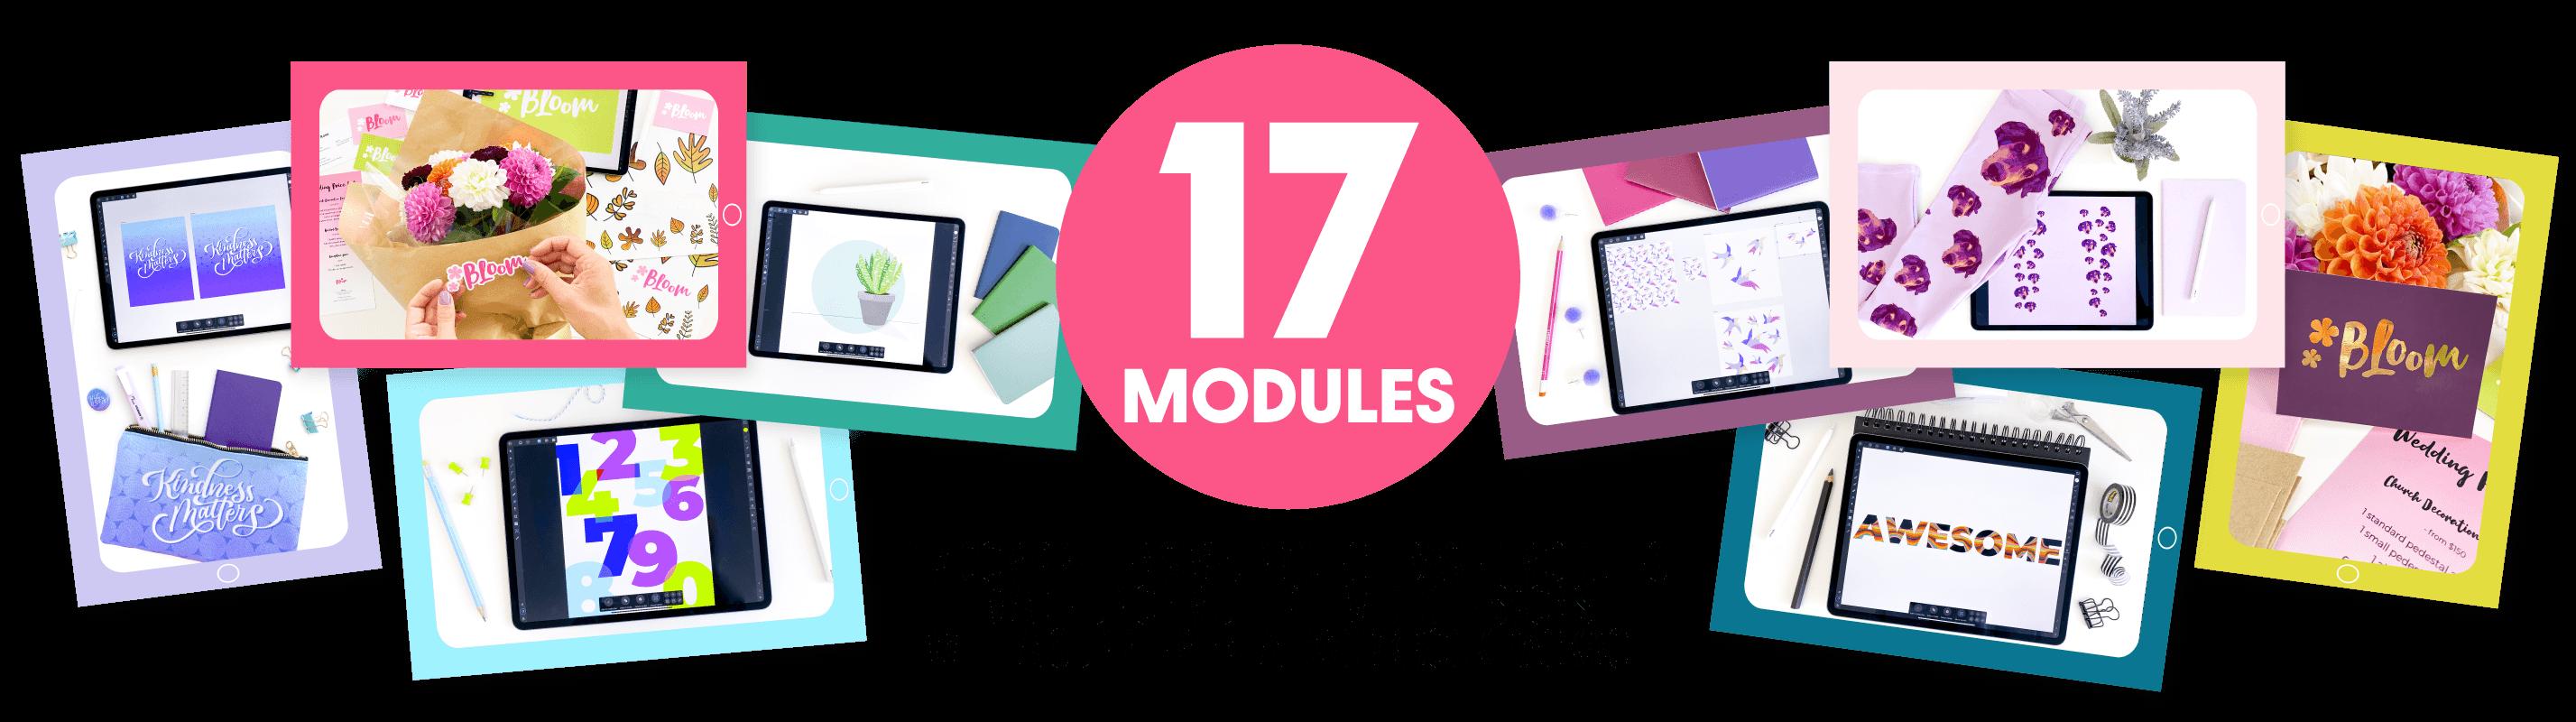 iPad-Vectors-Made-Easy-Modules-Photo